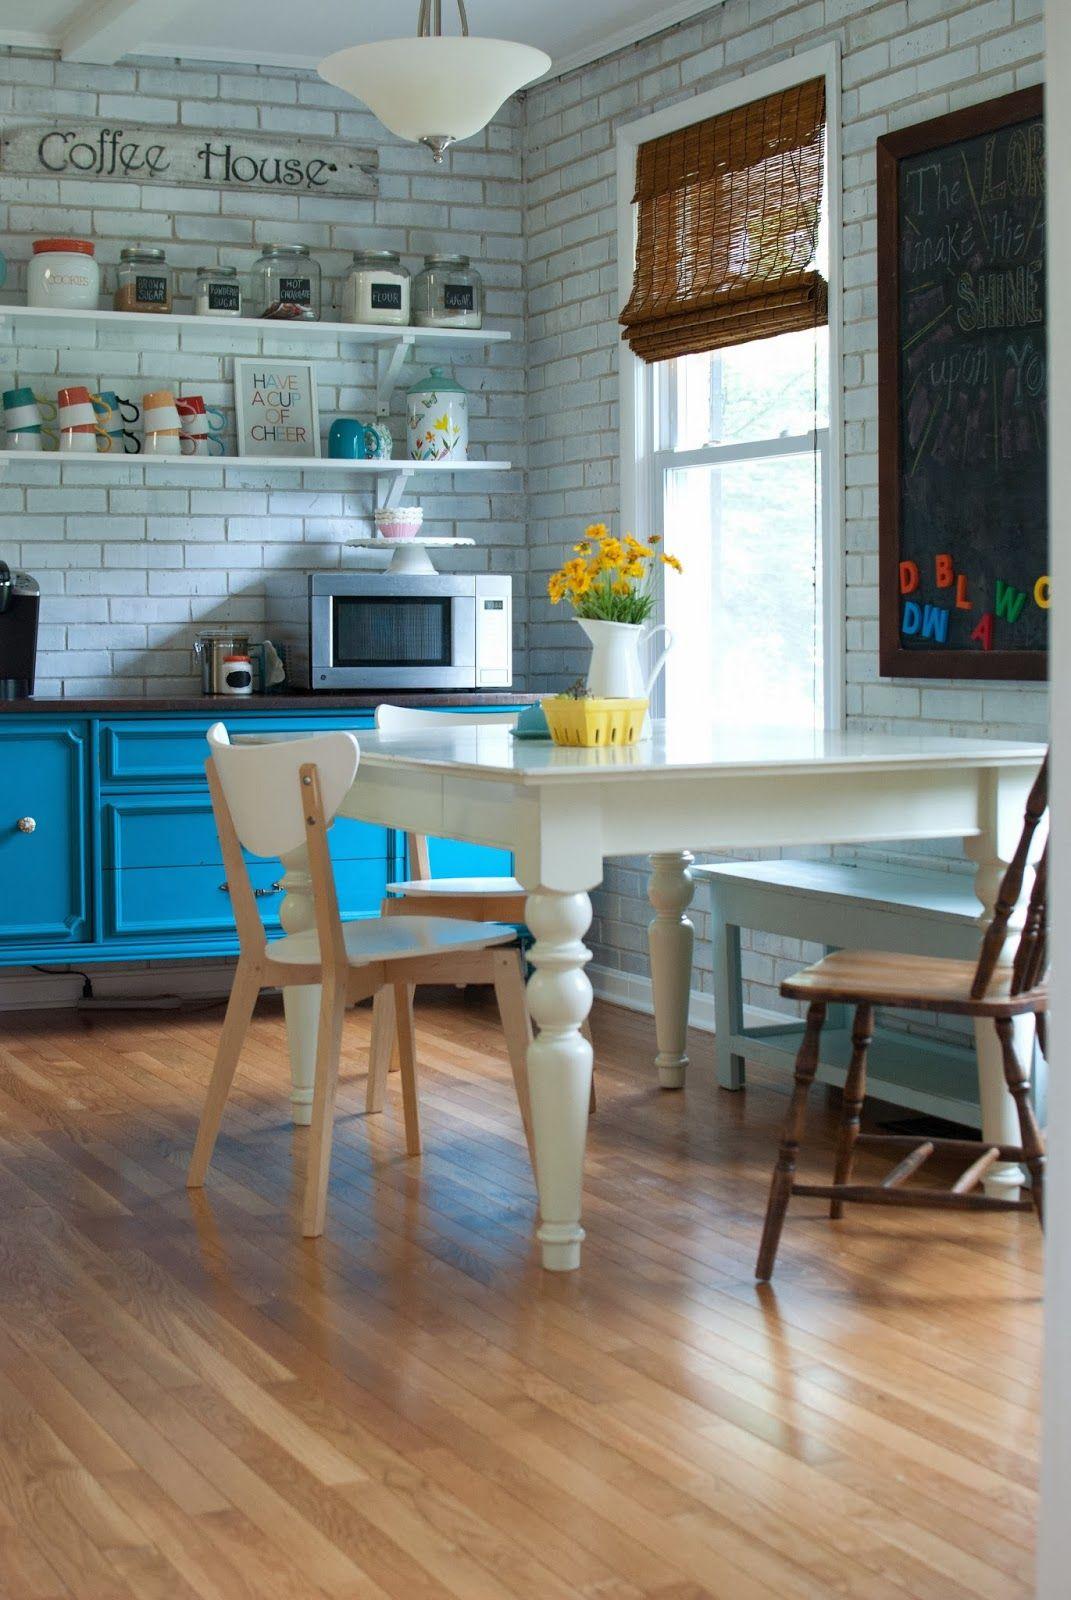 Pin by Sandra Poompan on Kitchen | Pinterest | House